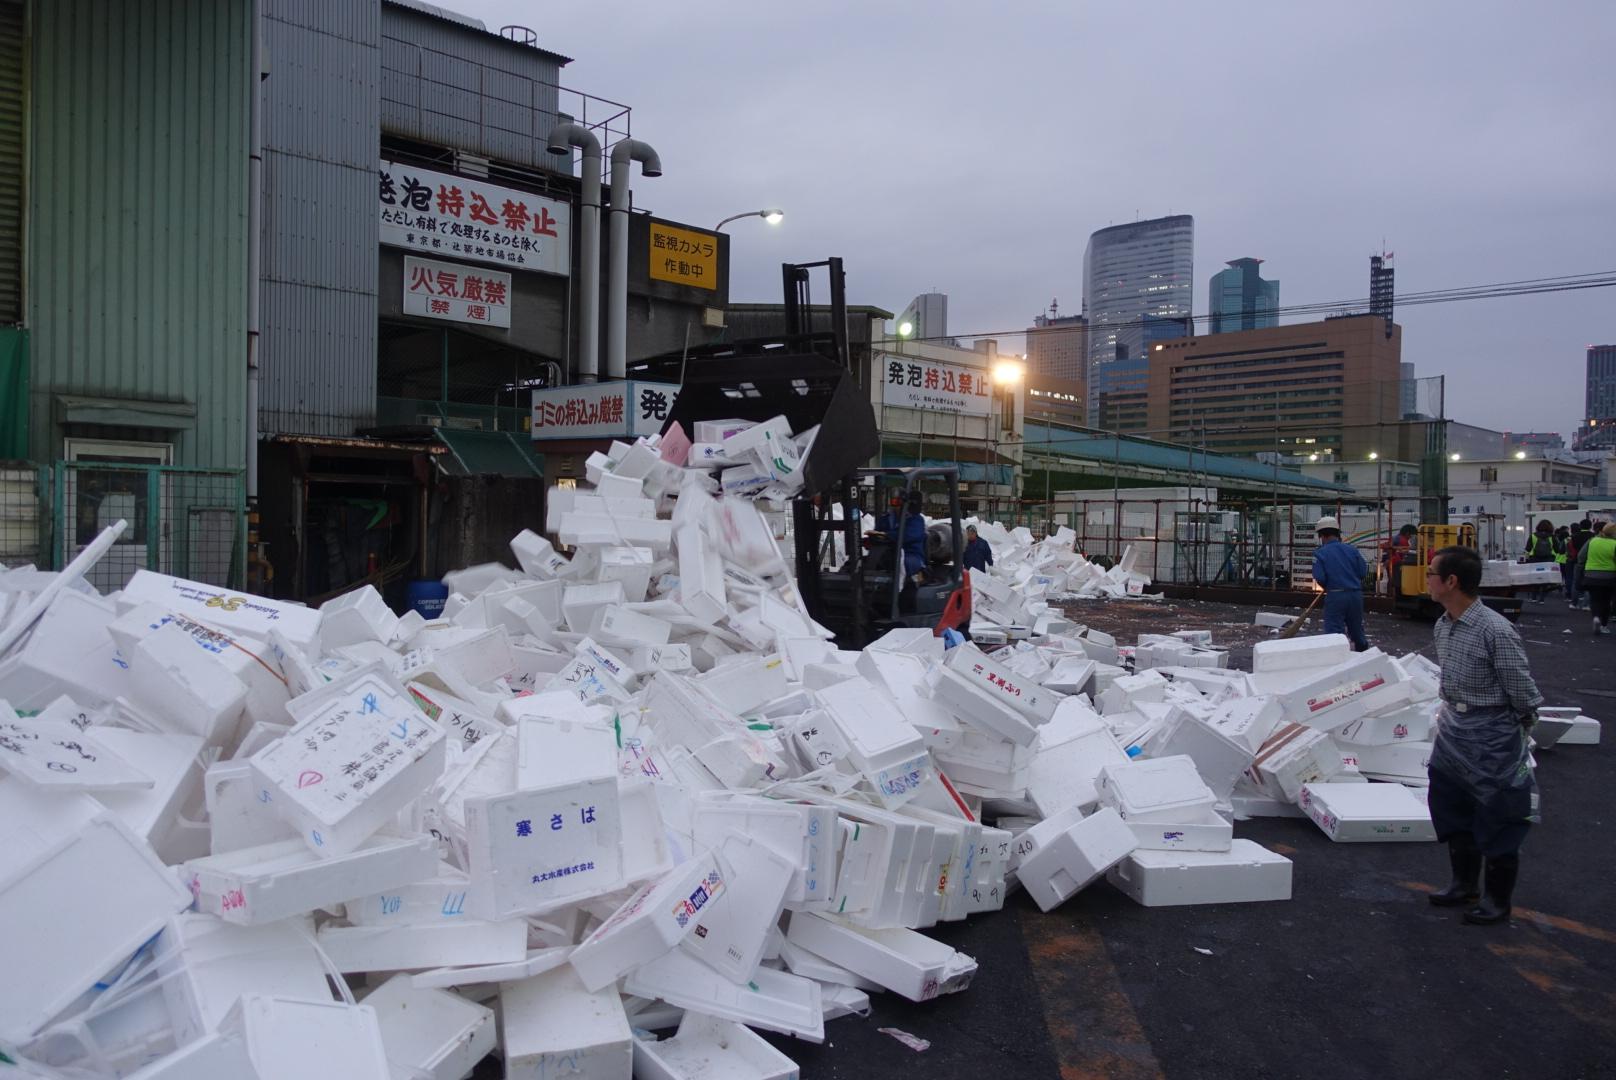 tsukiji fish market. Black Bedroom Furniture Sets. Home Design Ideas